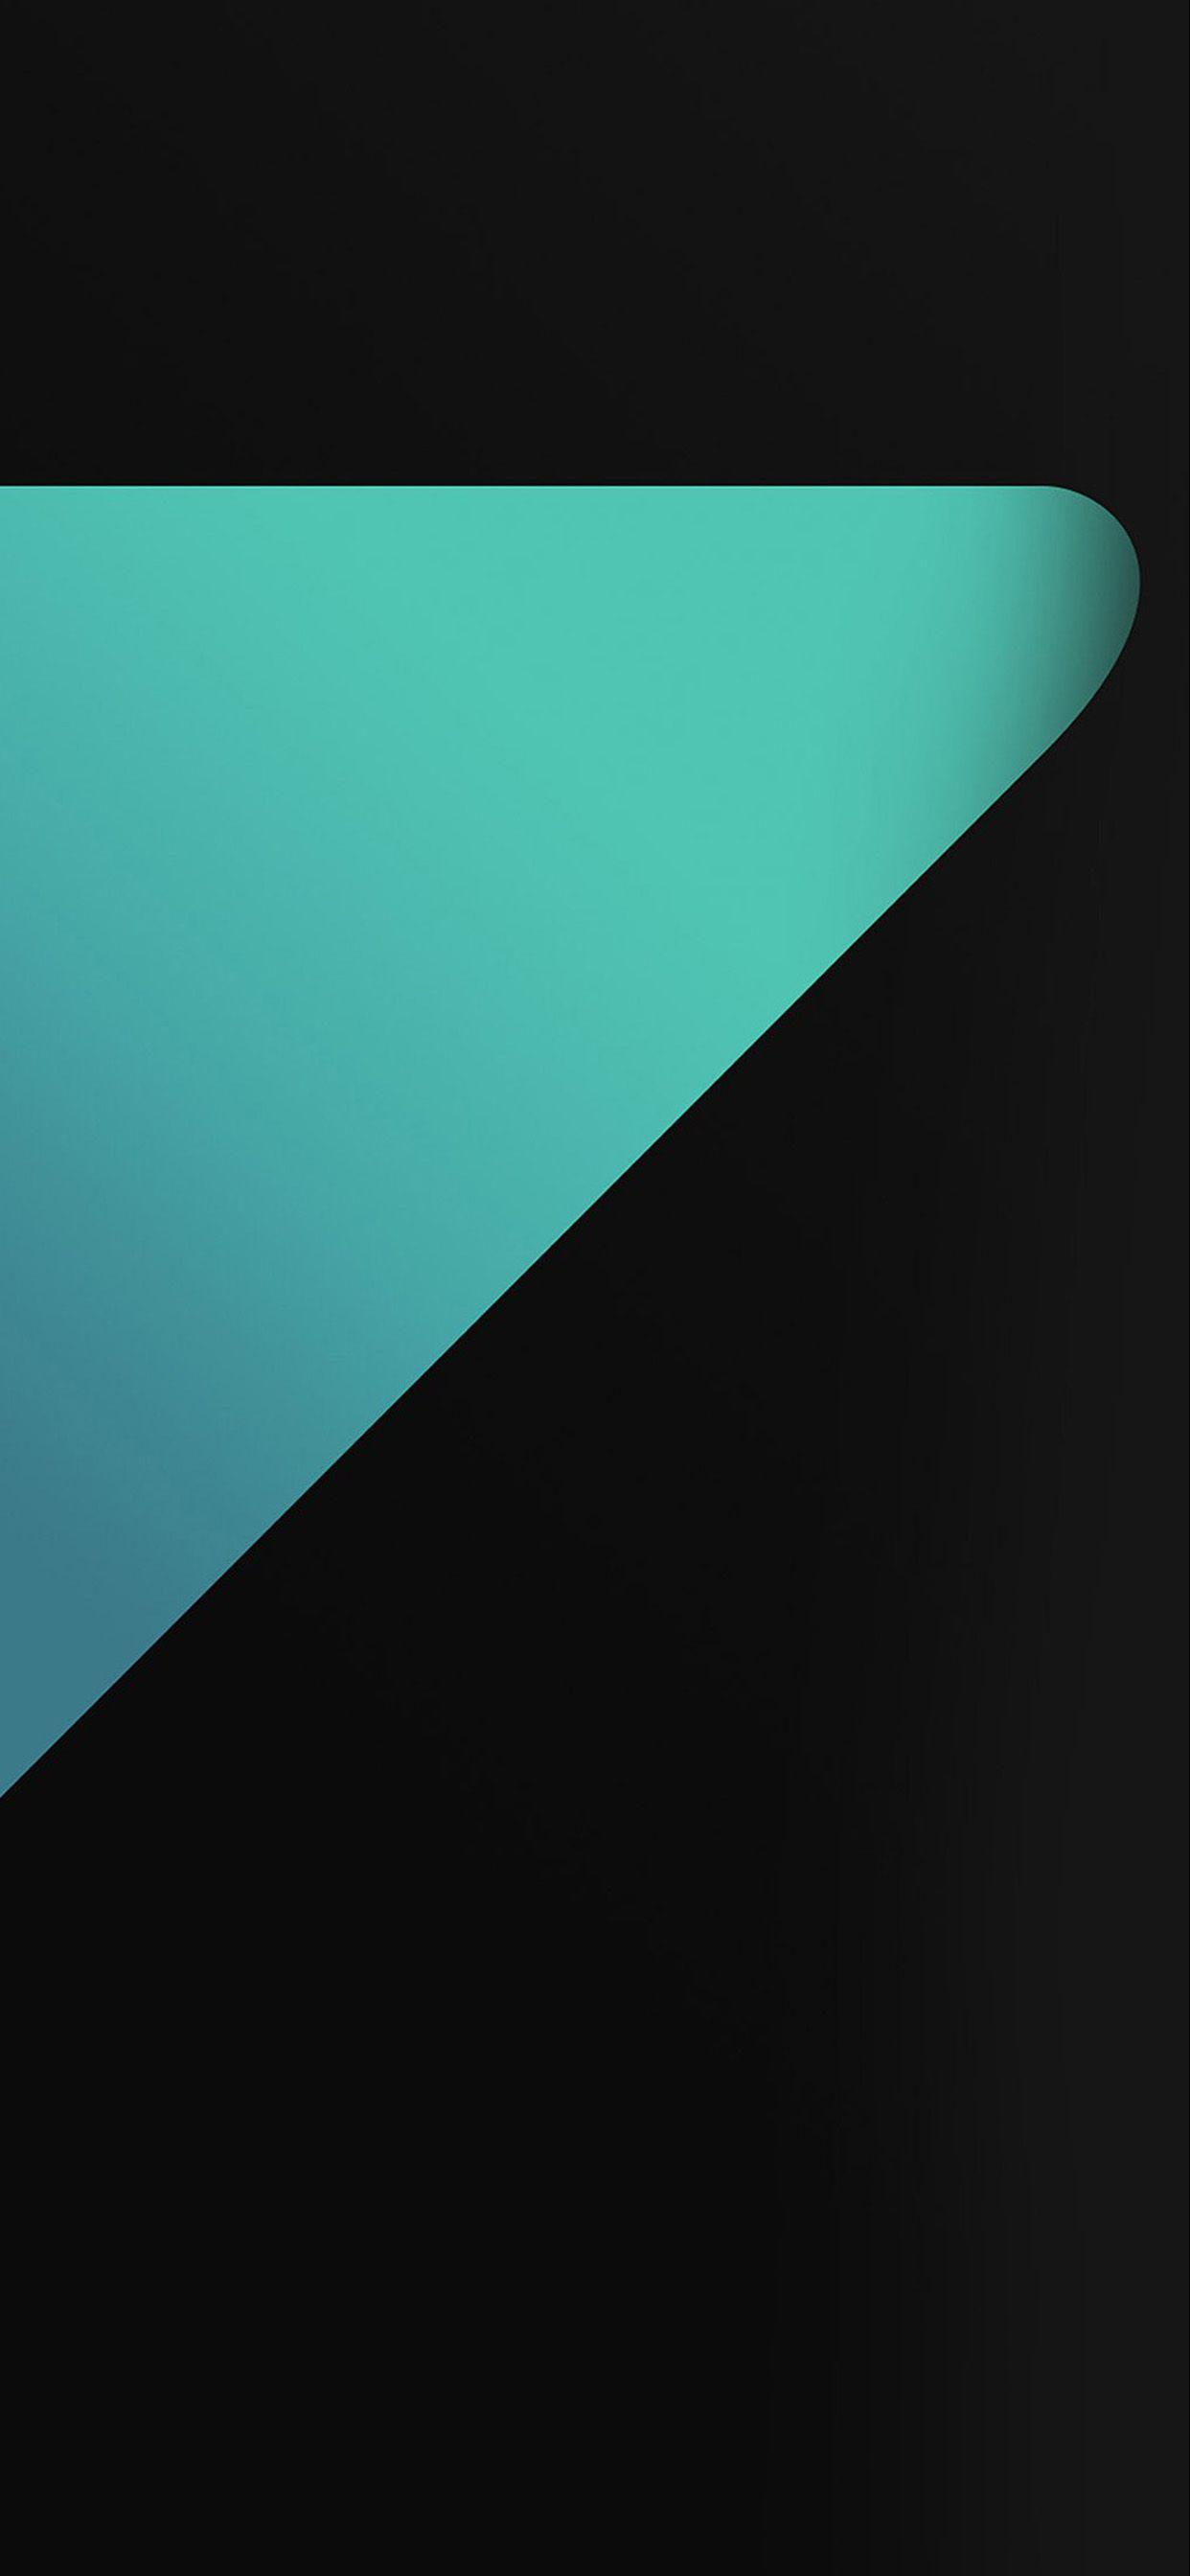 Geometric Iphone Xs Max Wallpaper Cool Wallpapers For Phones Hd Wallpaper Iphone Geometric Iphone